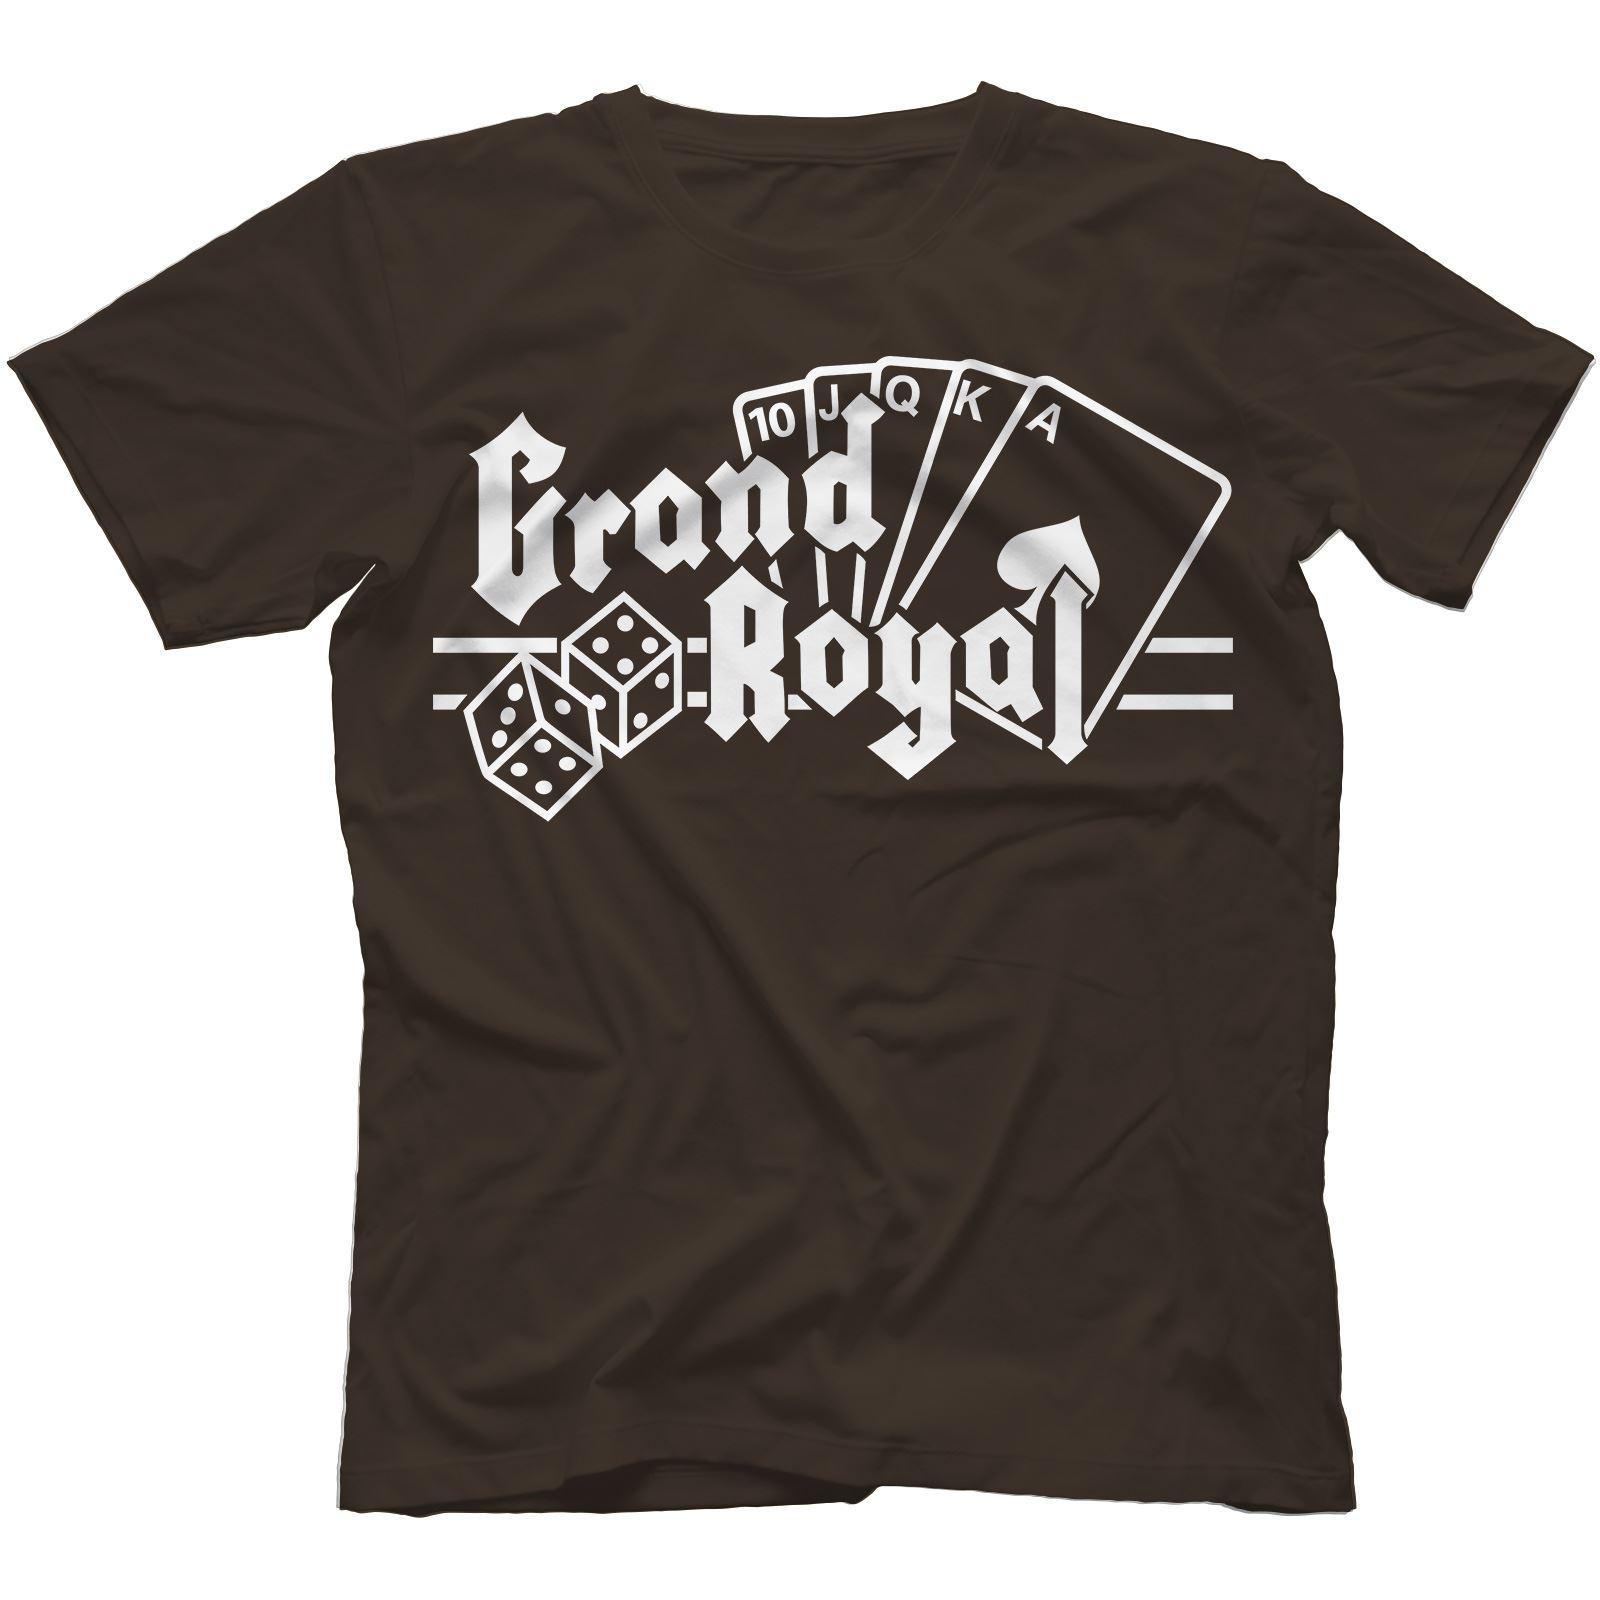 0ed4471a Grand Royal Records T-Shirt 100% Cotton Beastie Boys Hip Hop ...